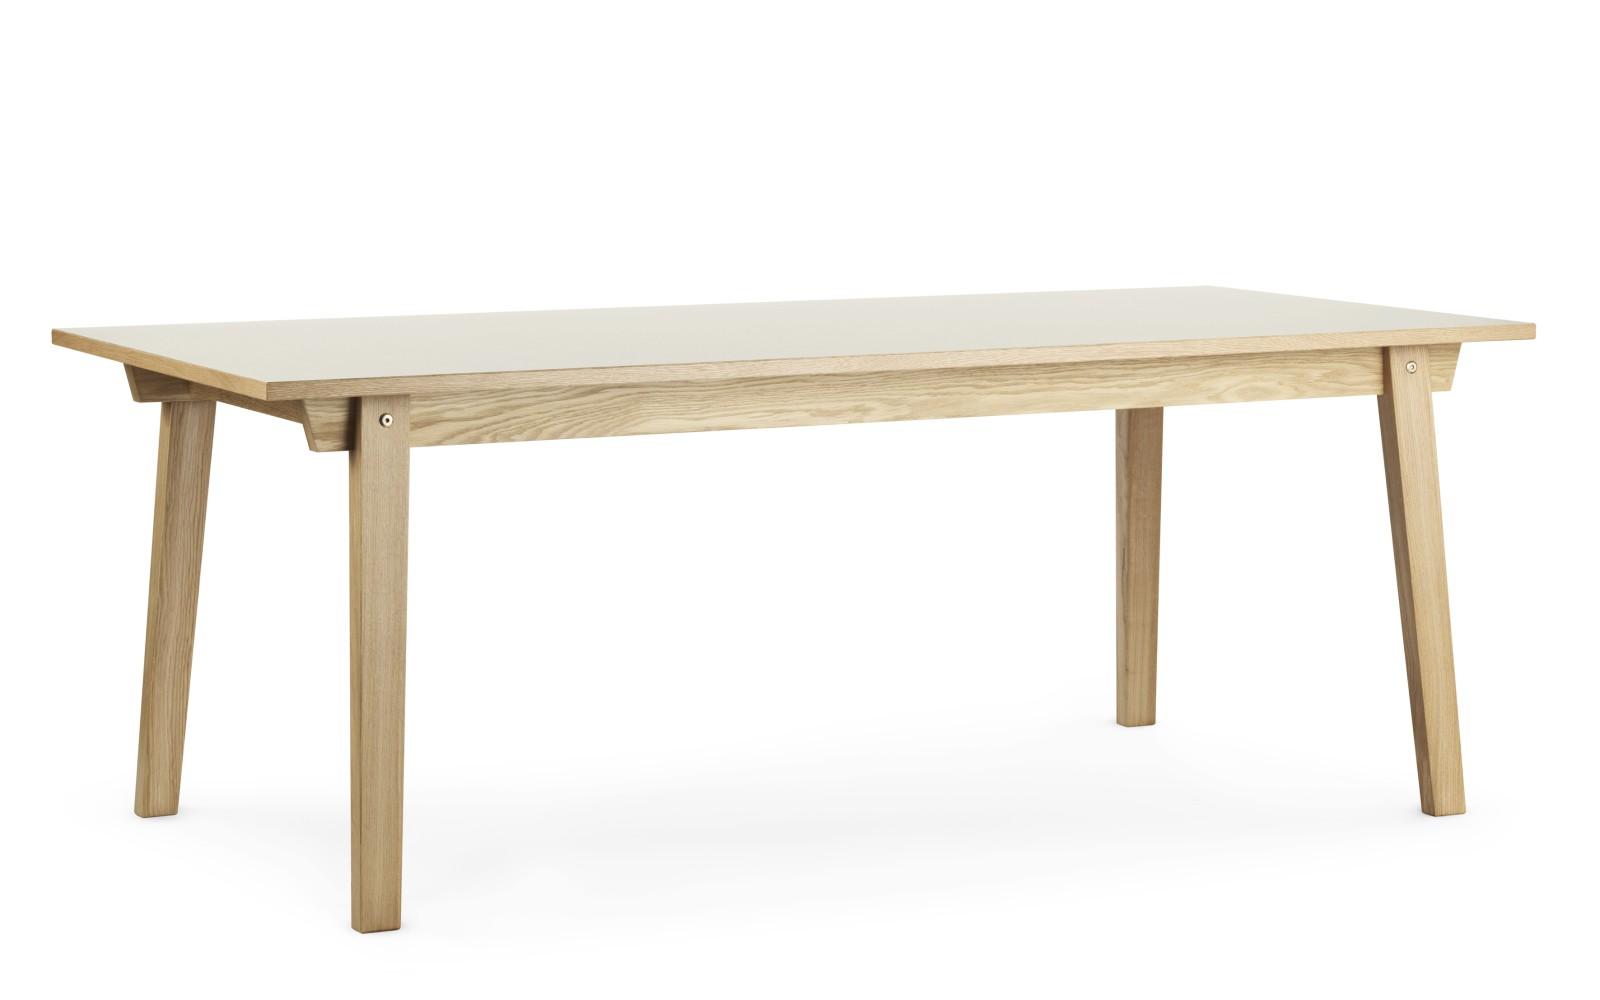 Slice Dining Table Linoleum Creme Top, 90 x 200